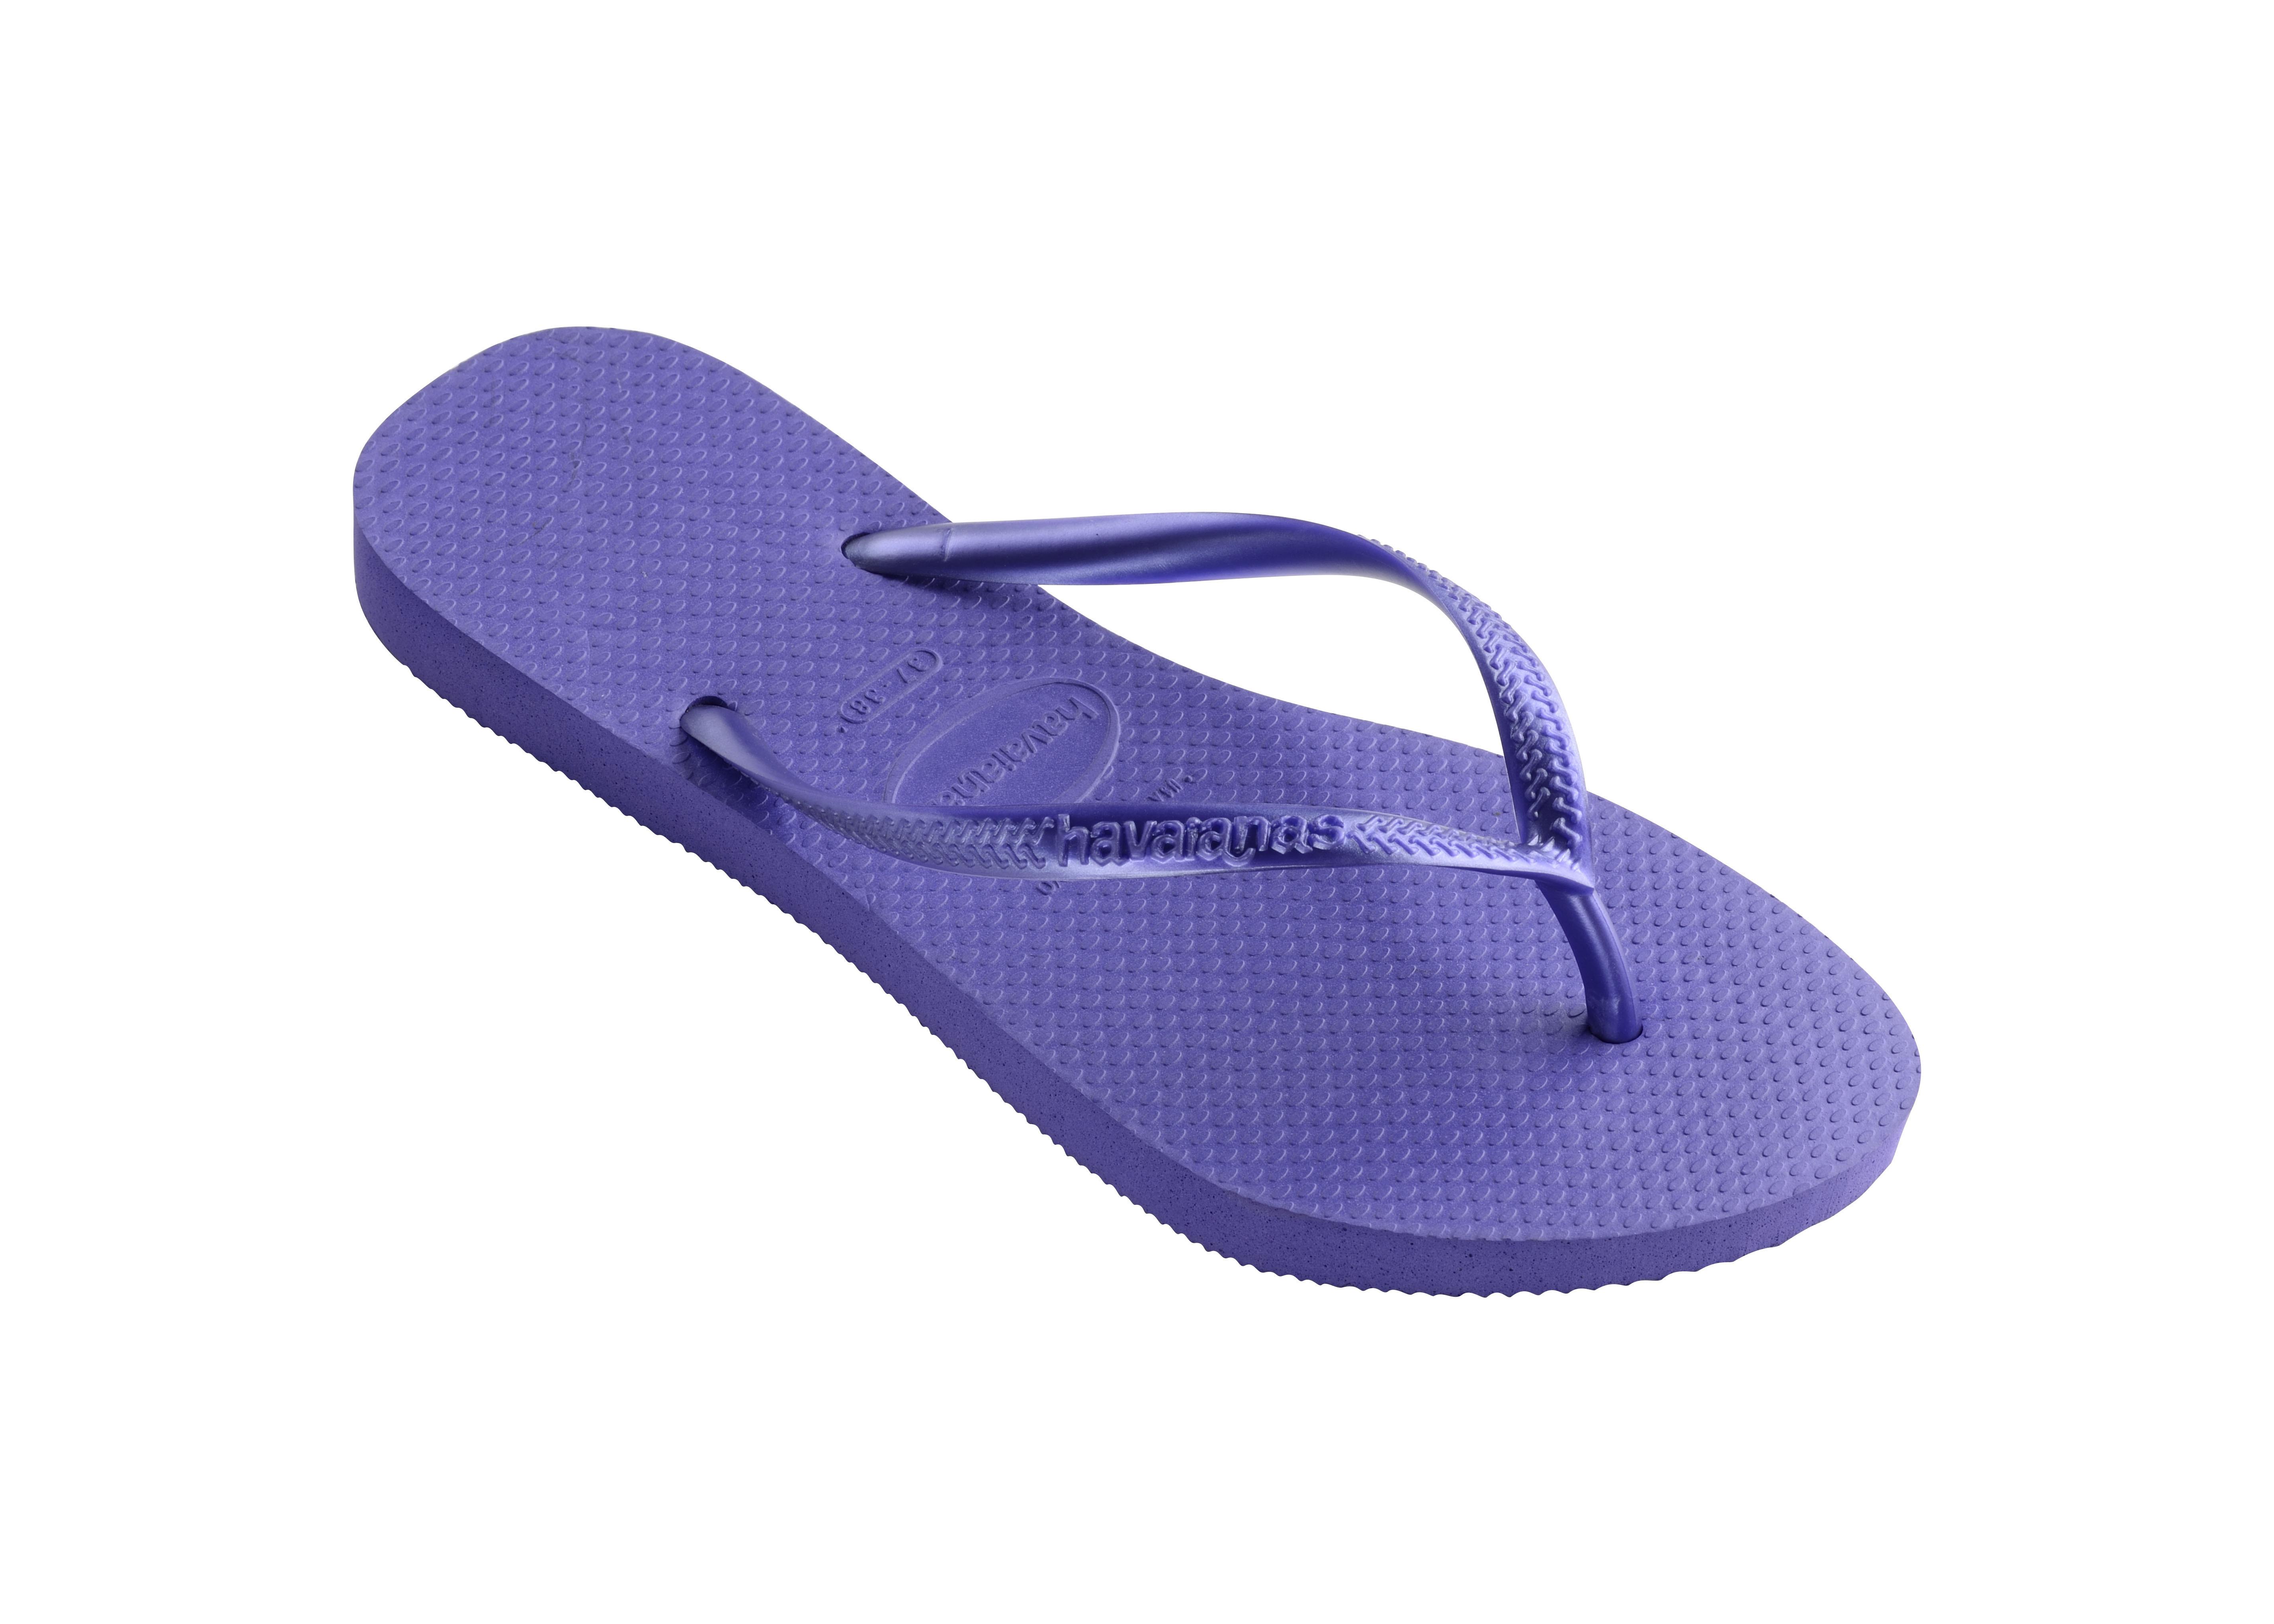 purple_purple_4000030_8442_a